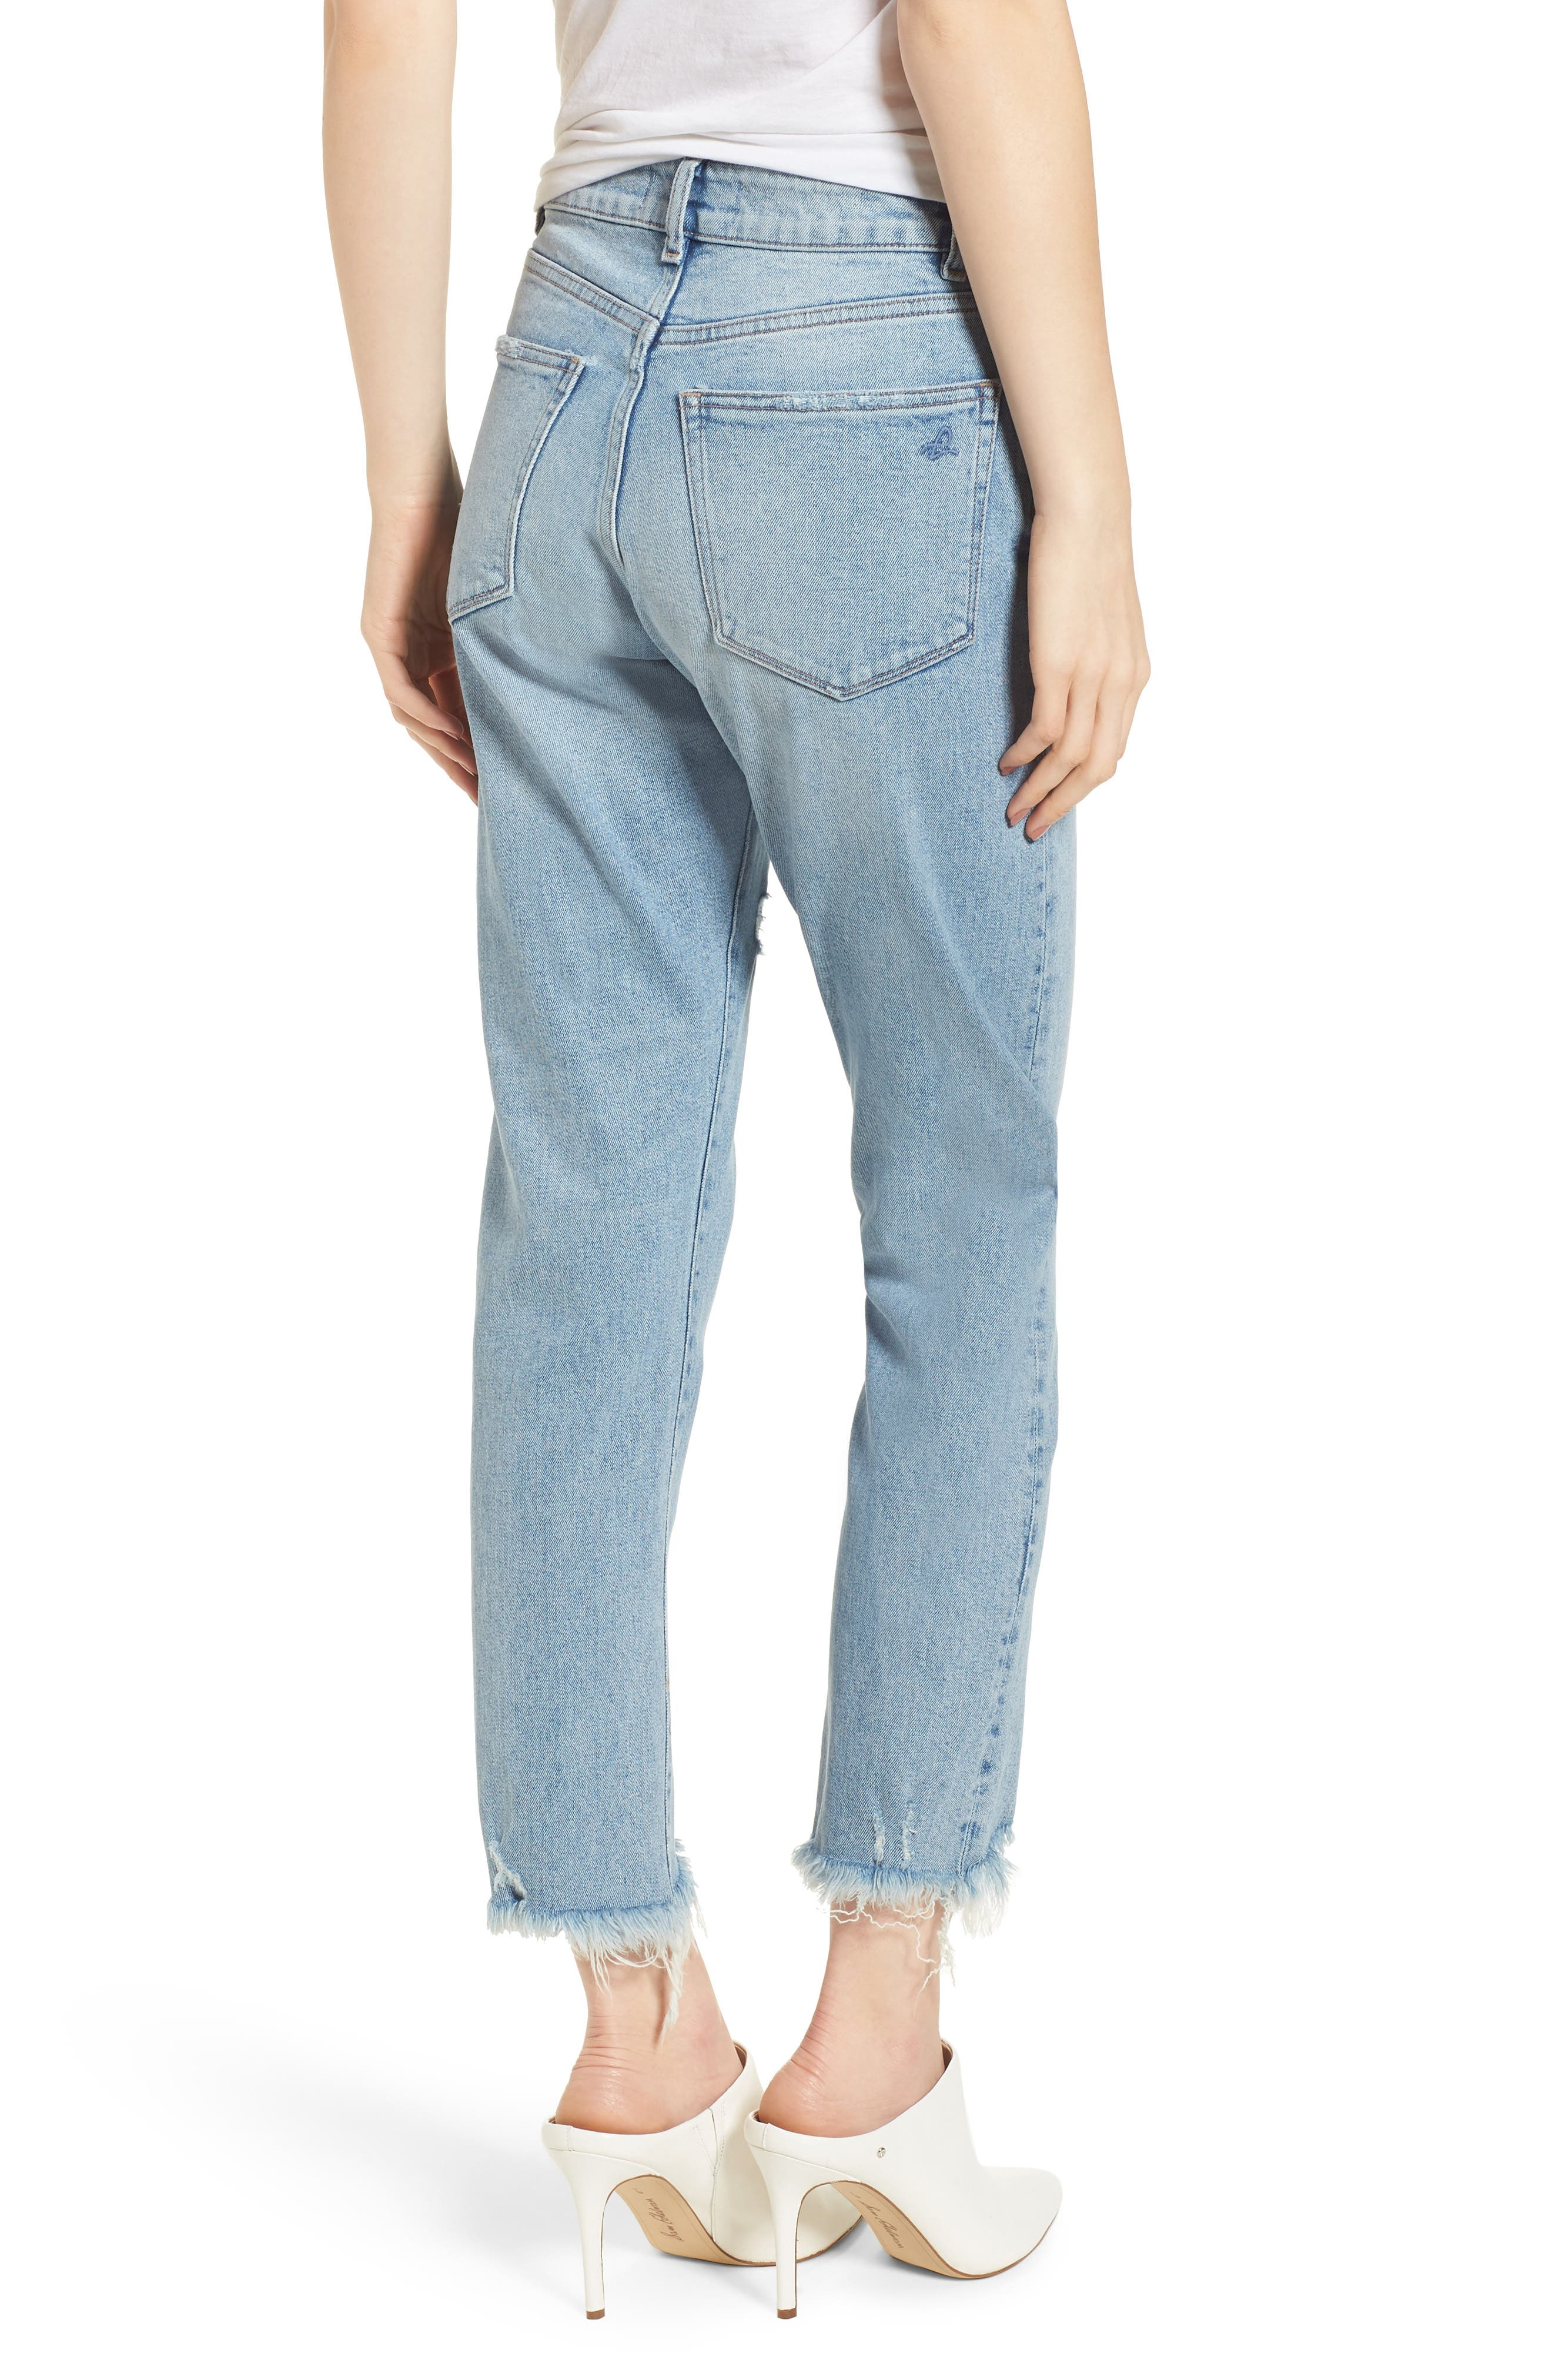 Bella Vintage Crop Slim Jeans,                             Alternate thumbnail 2, color,                             Super Bleach